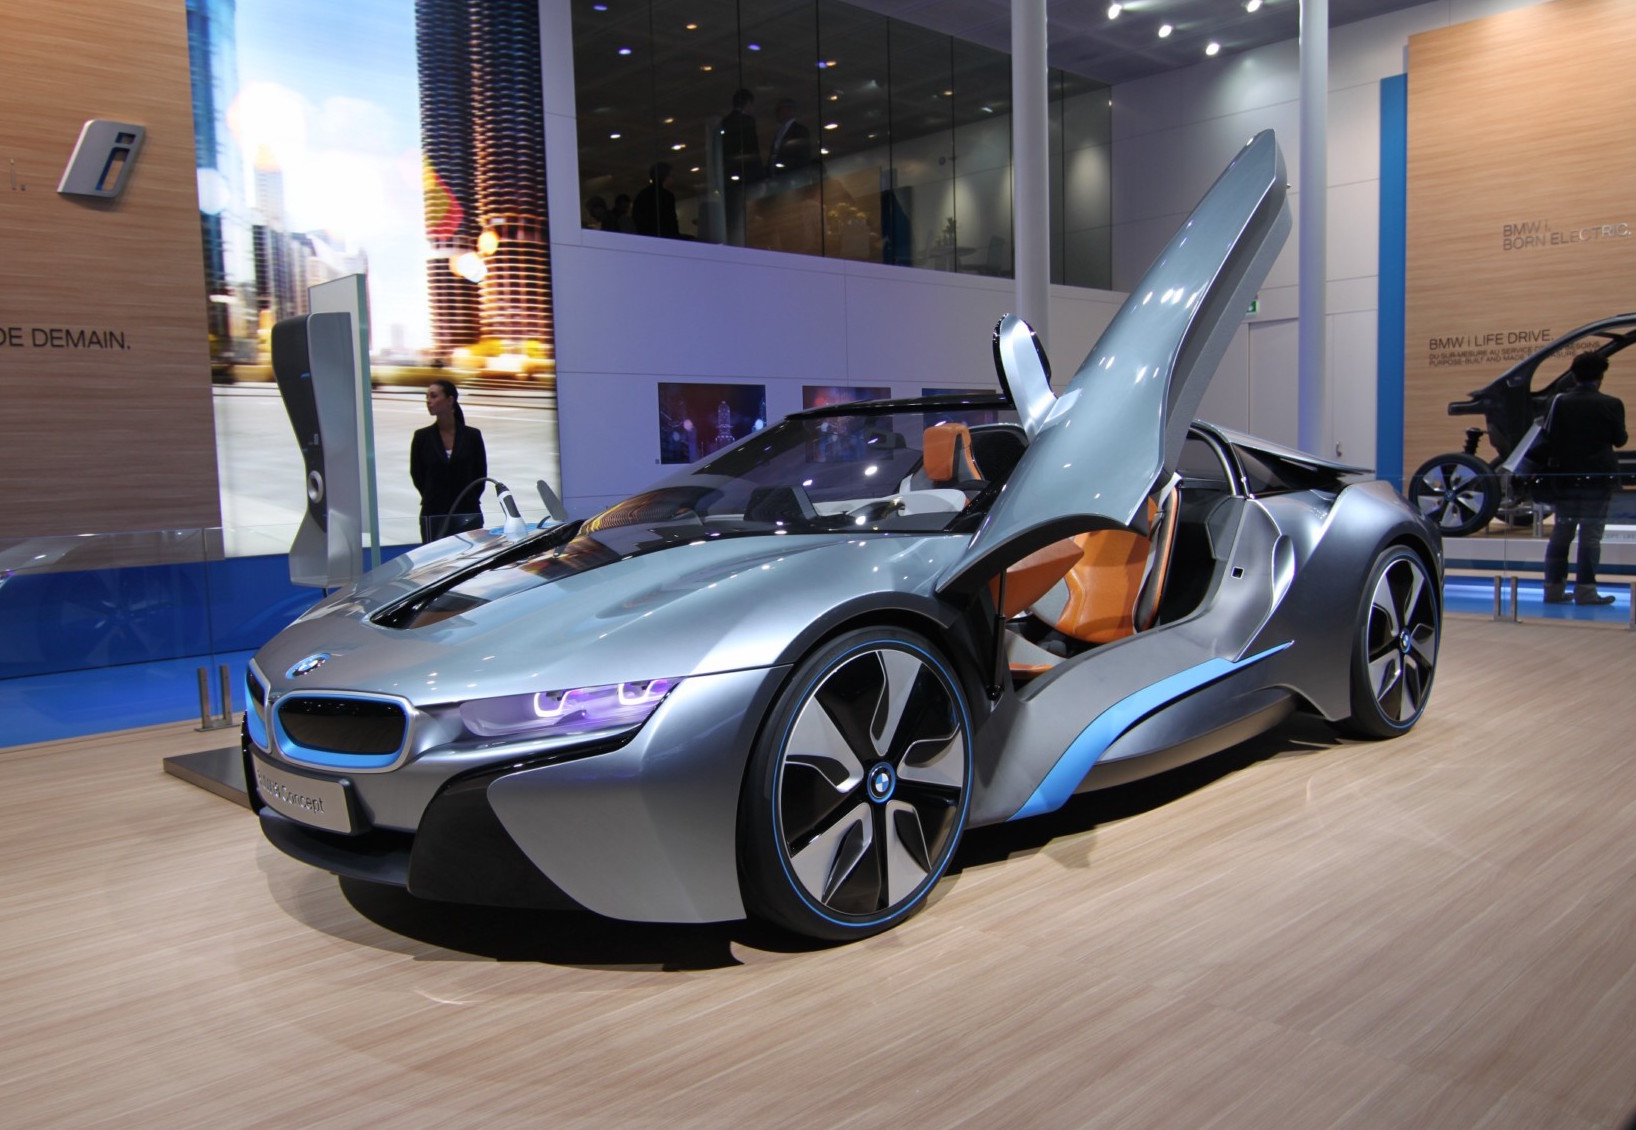 Electric Cars To Dominate Paris Auto Show Tires Parts News - Auto show prices